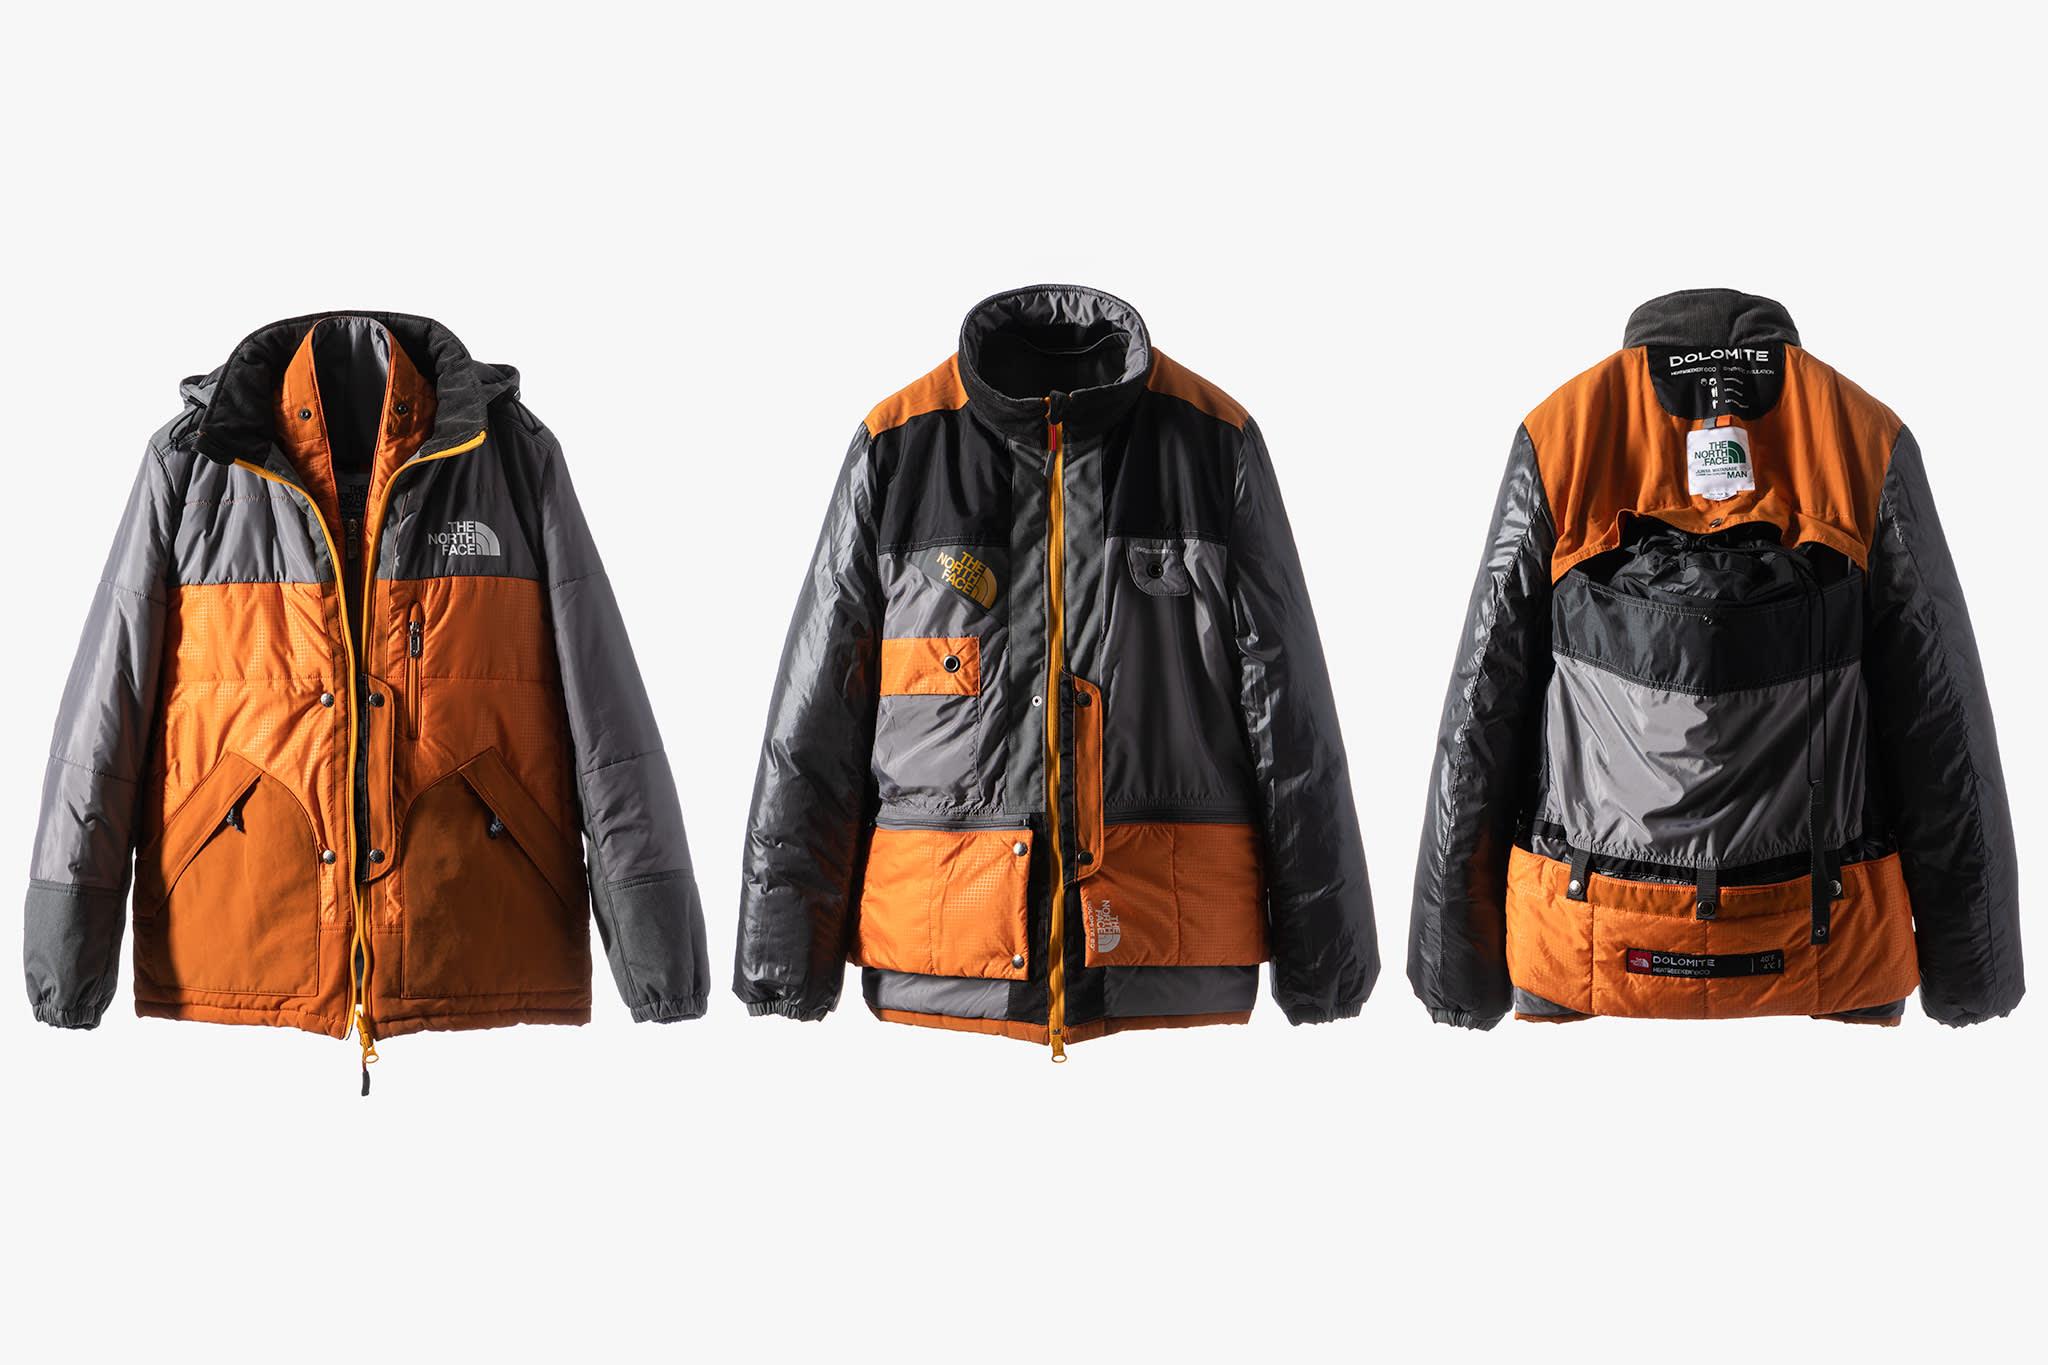 2e8de638c Junya Watanabe MAN Transforms a The North Face Sleeping Bag ...